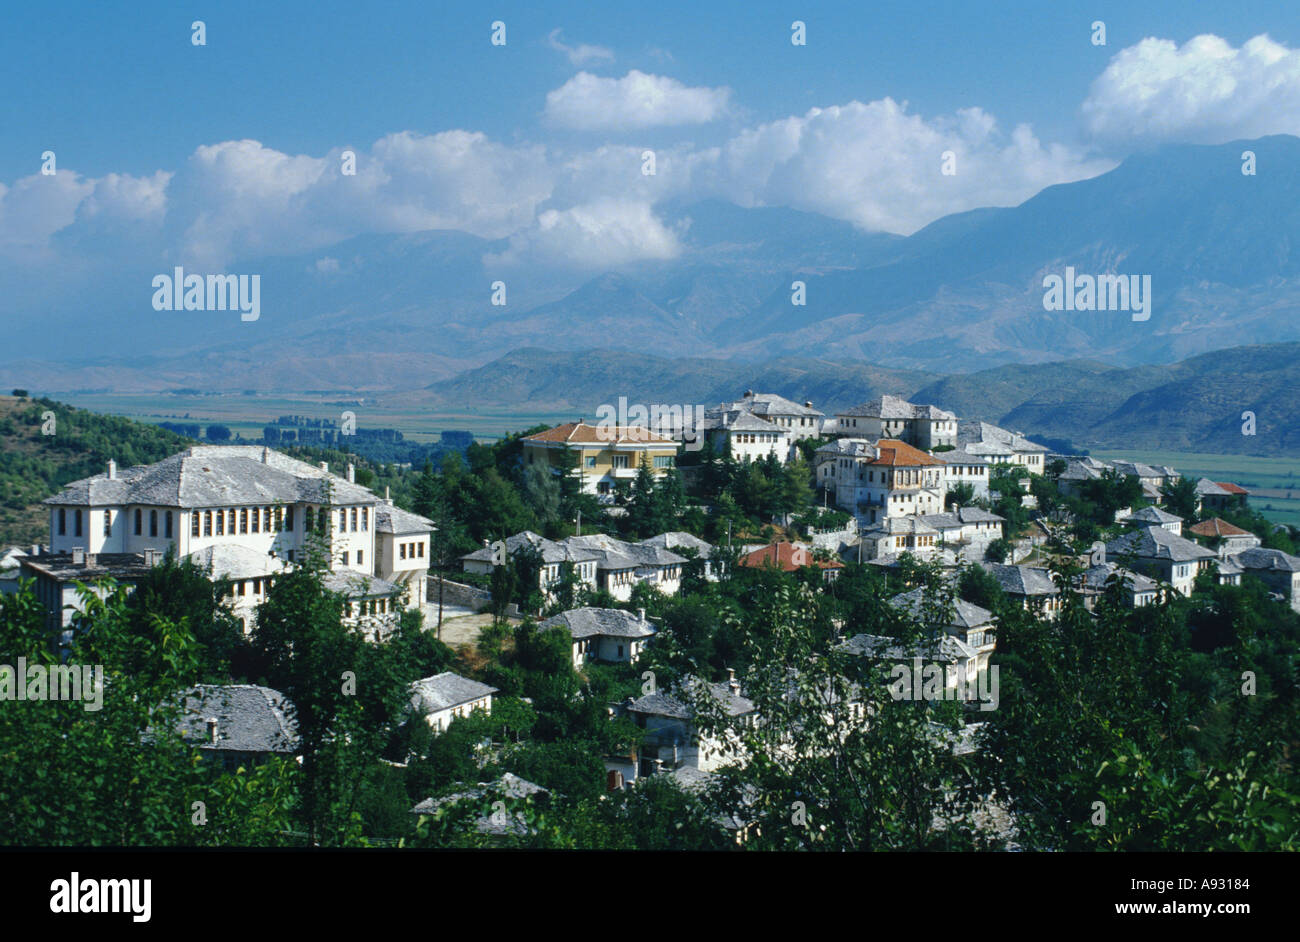 Albania Albanien city of Gjirokaster - Stock Image